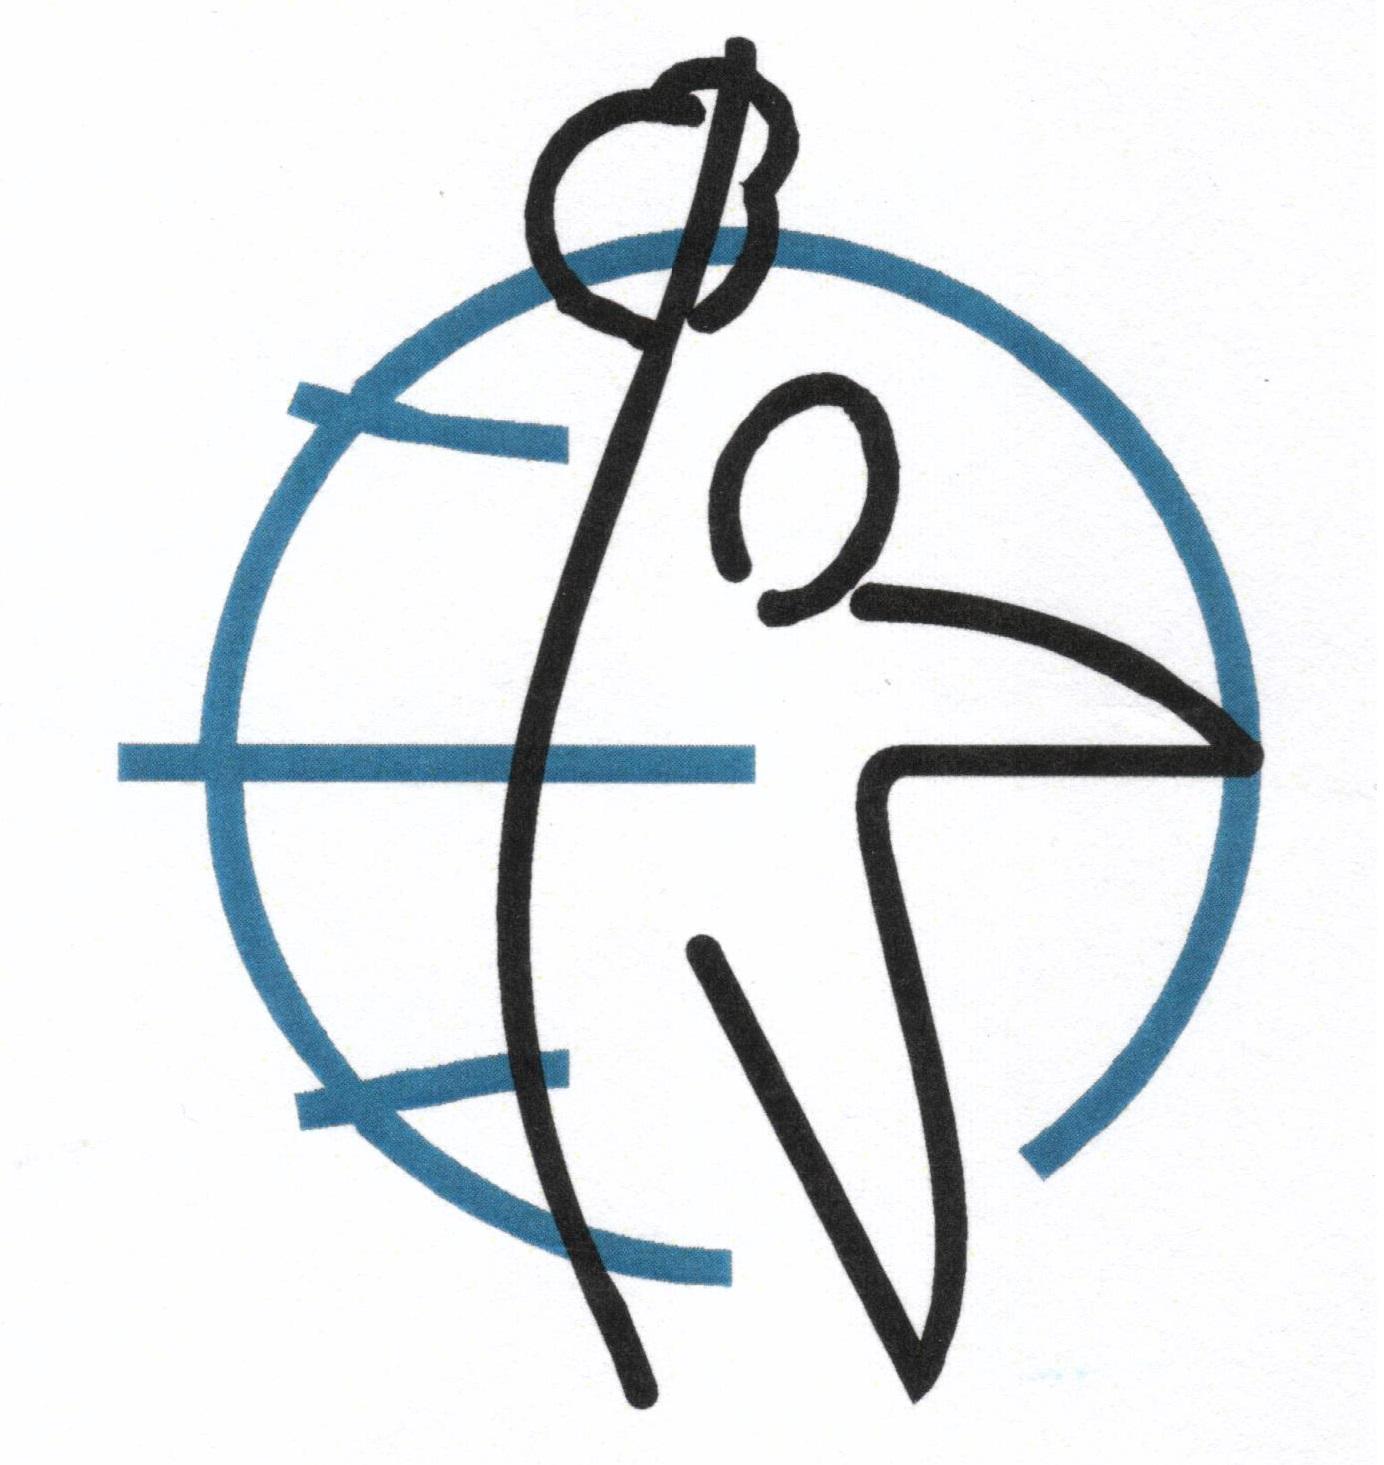 International Union Of Kettlebell Lifting (IUKL)